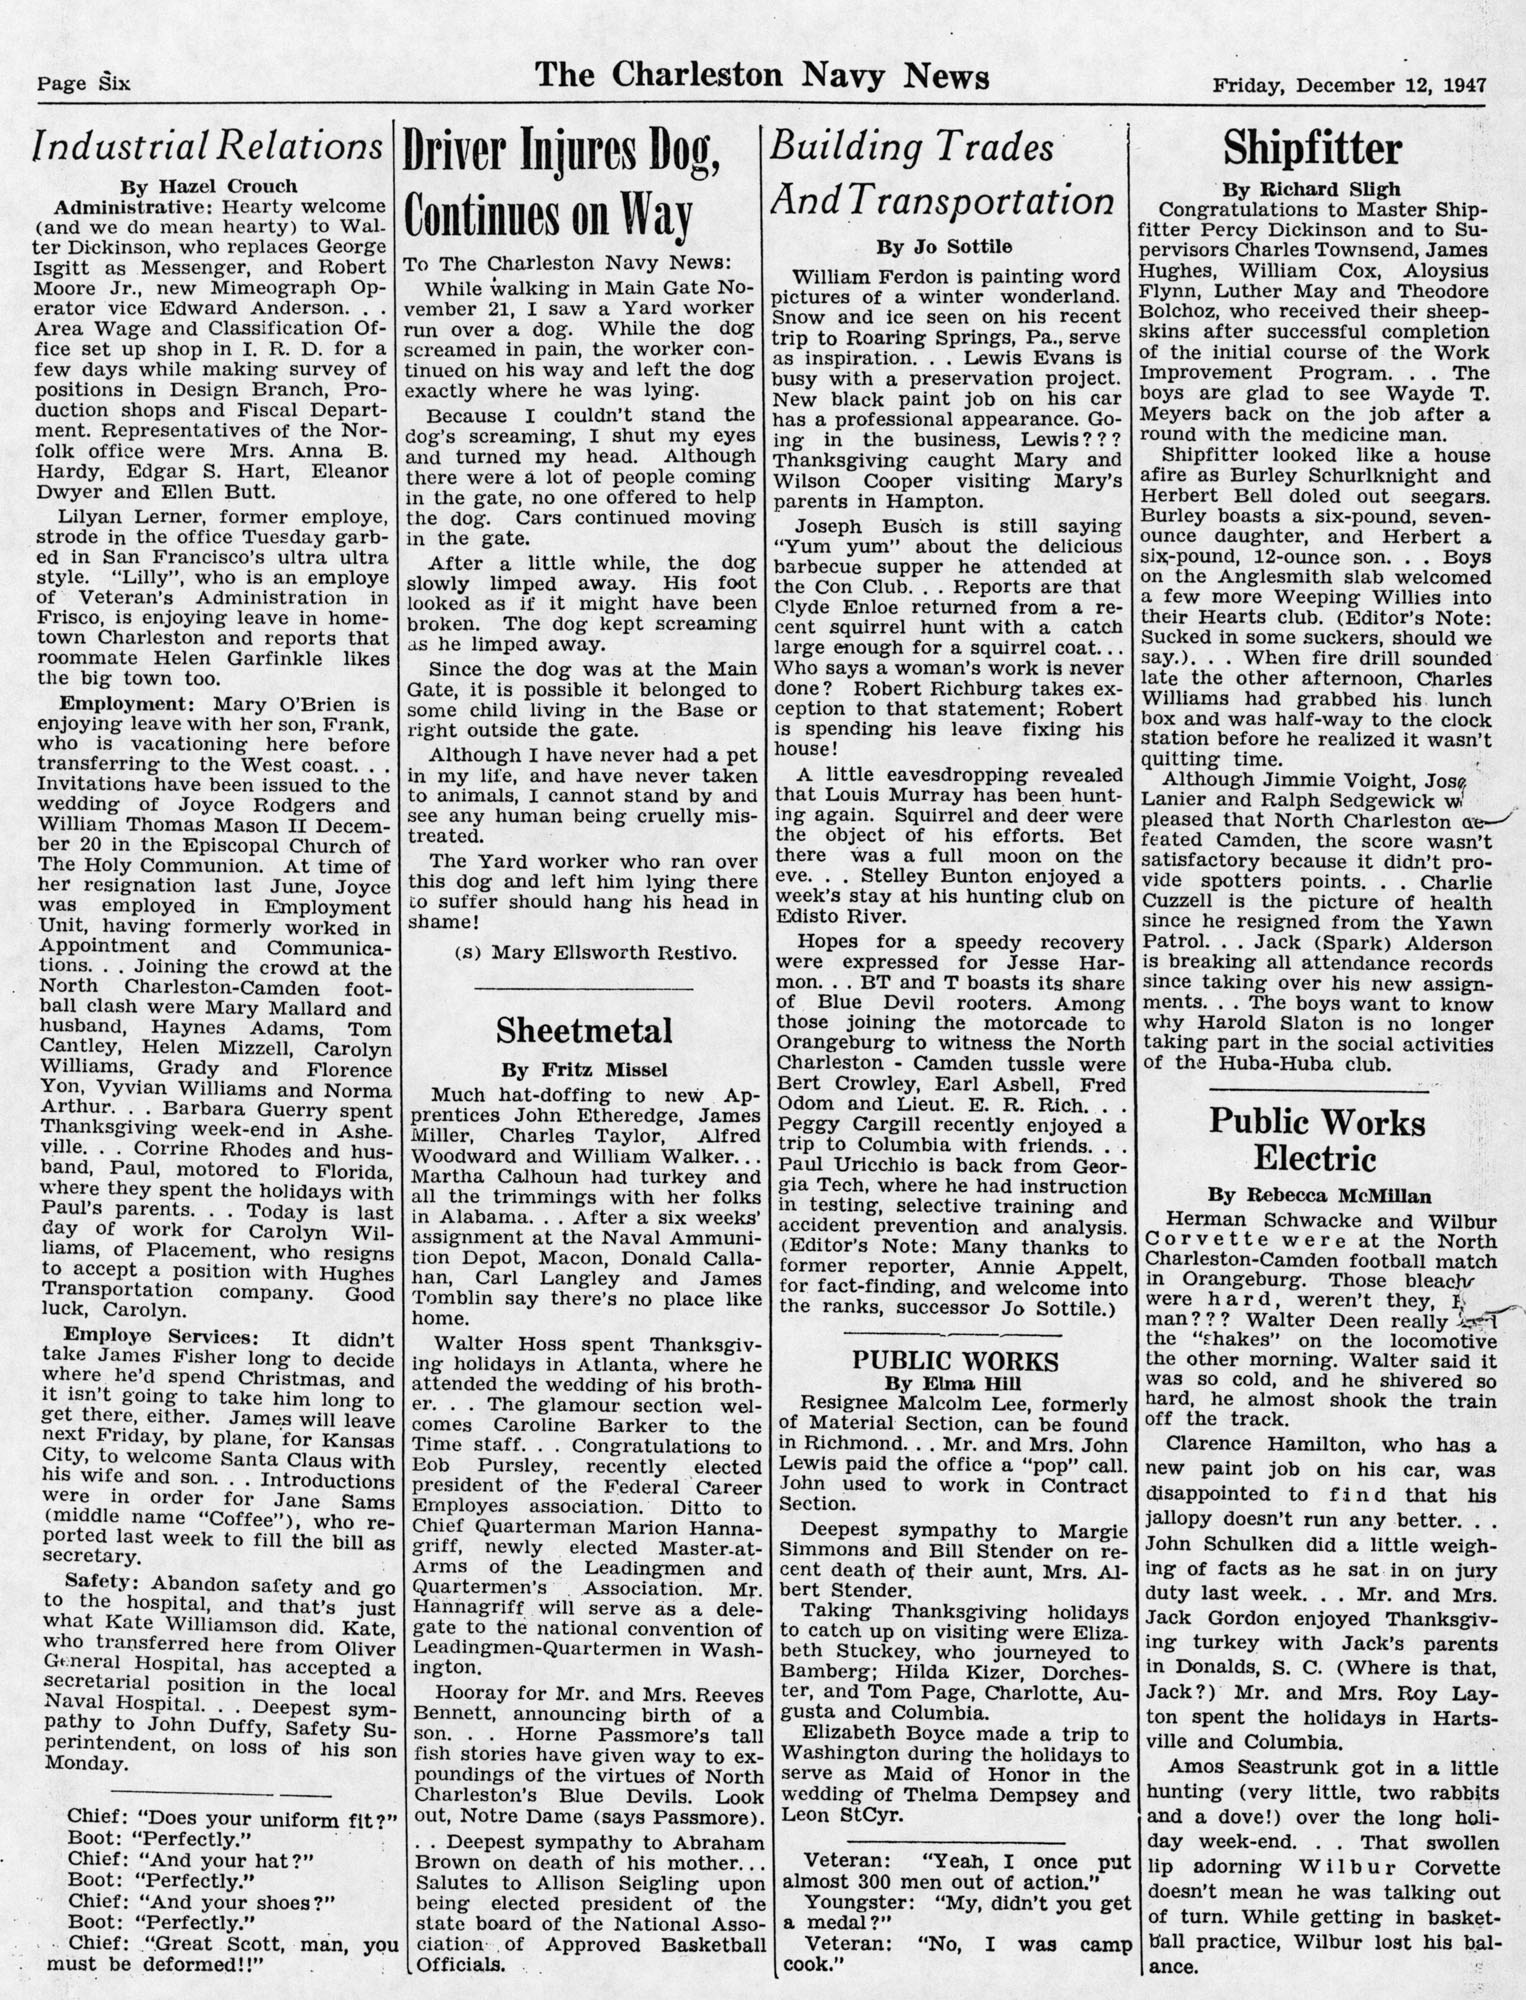 The Charleston Navy News, Volume 6, Edition 10, page vi